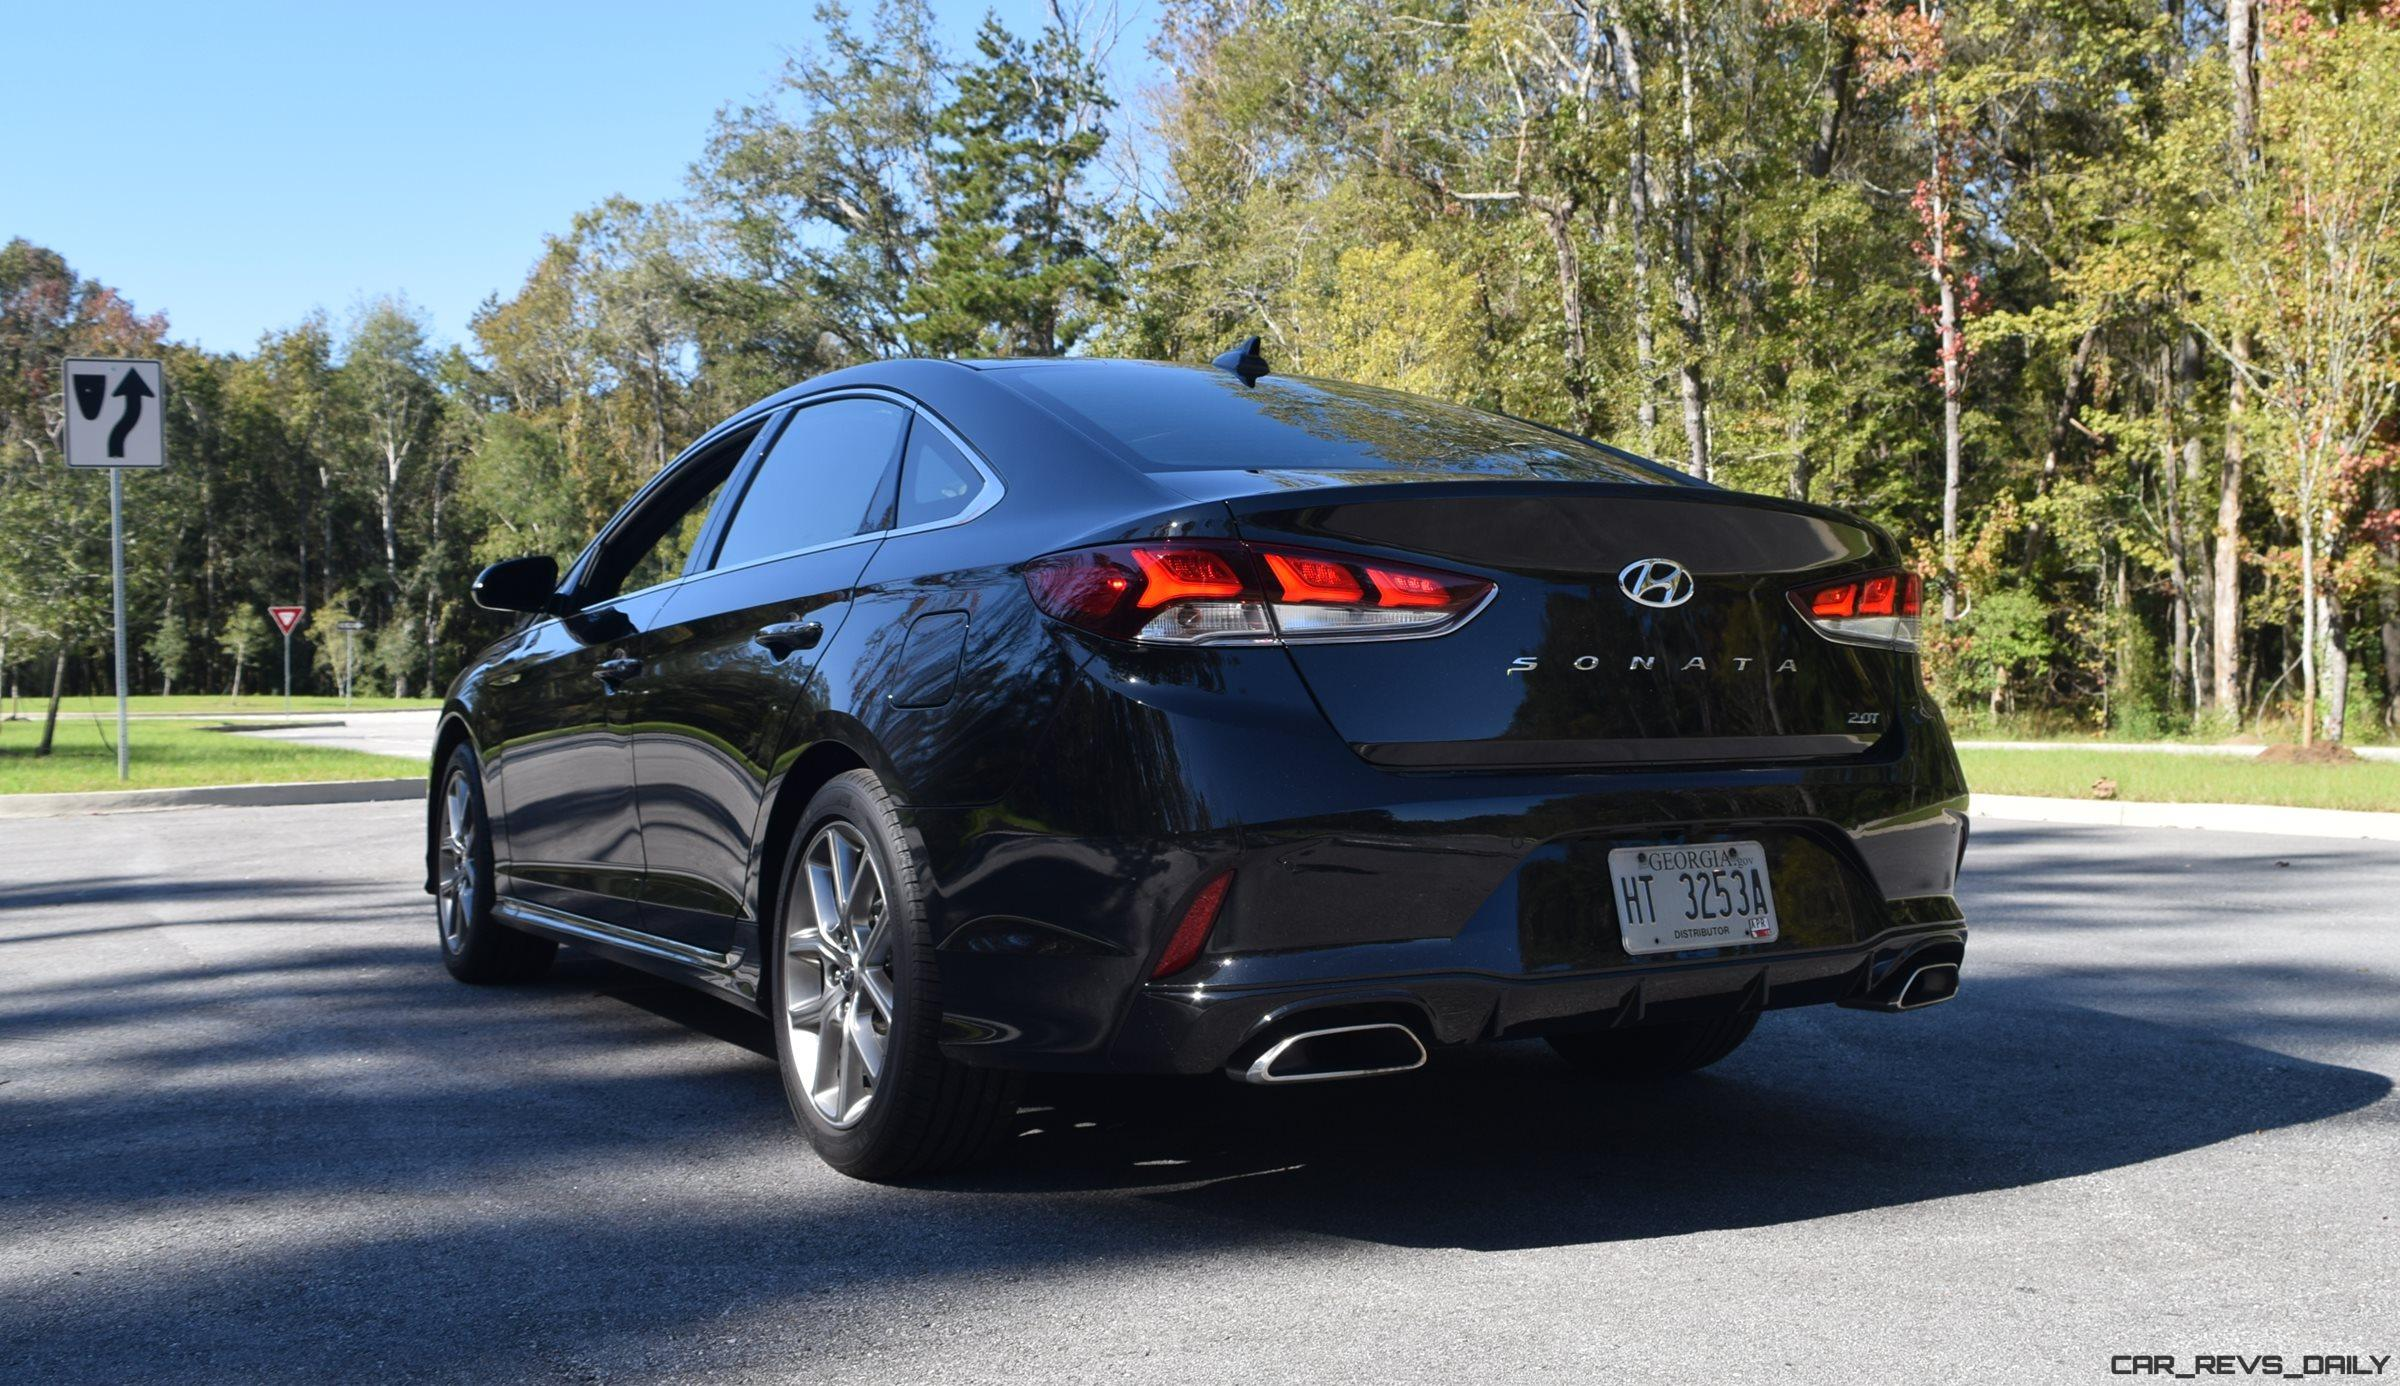 2018 Hyundai SONATA Limited 20T Road Test Review W